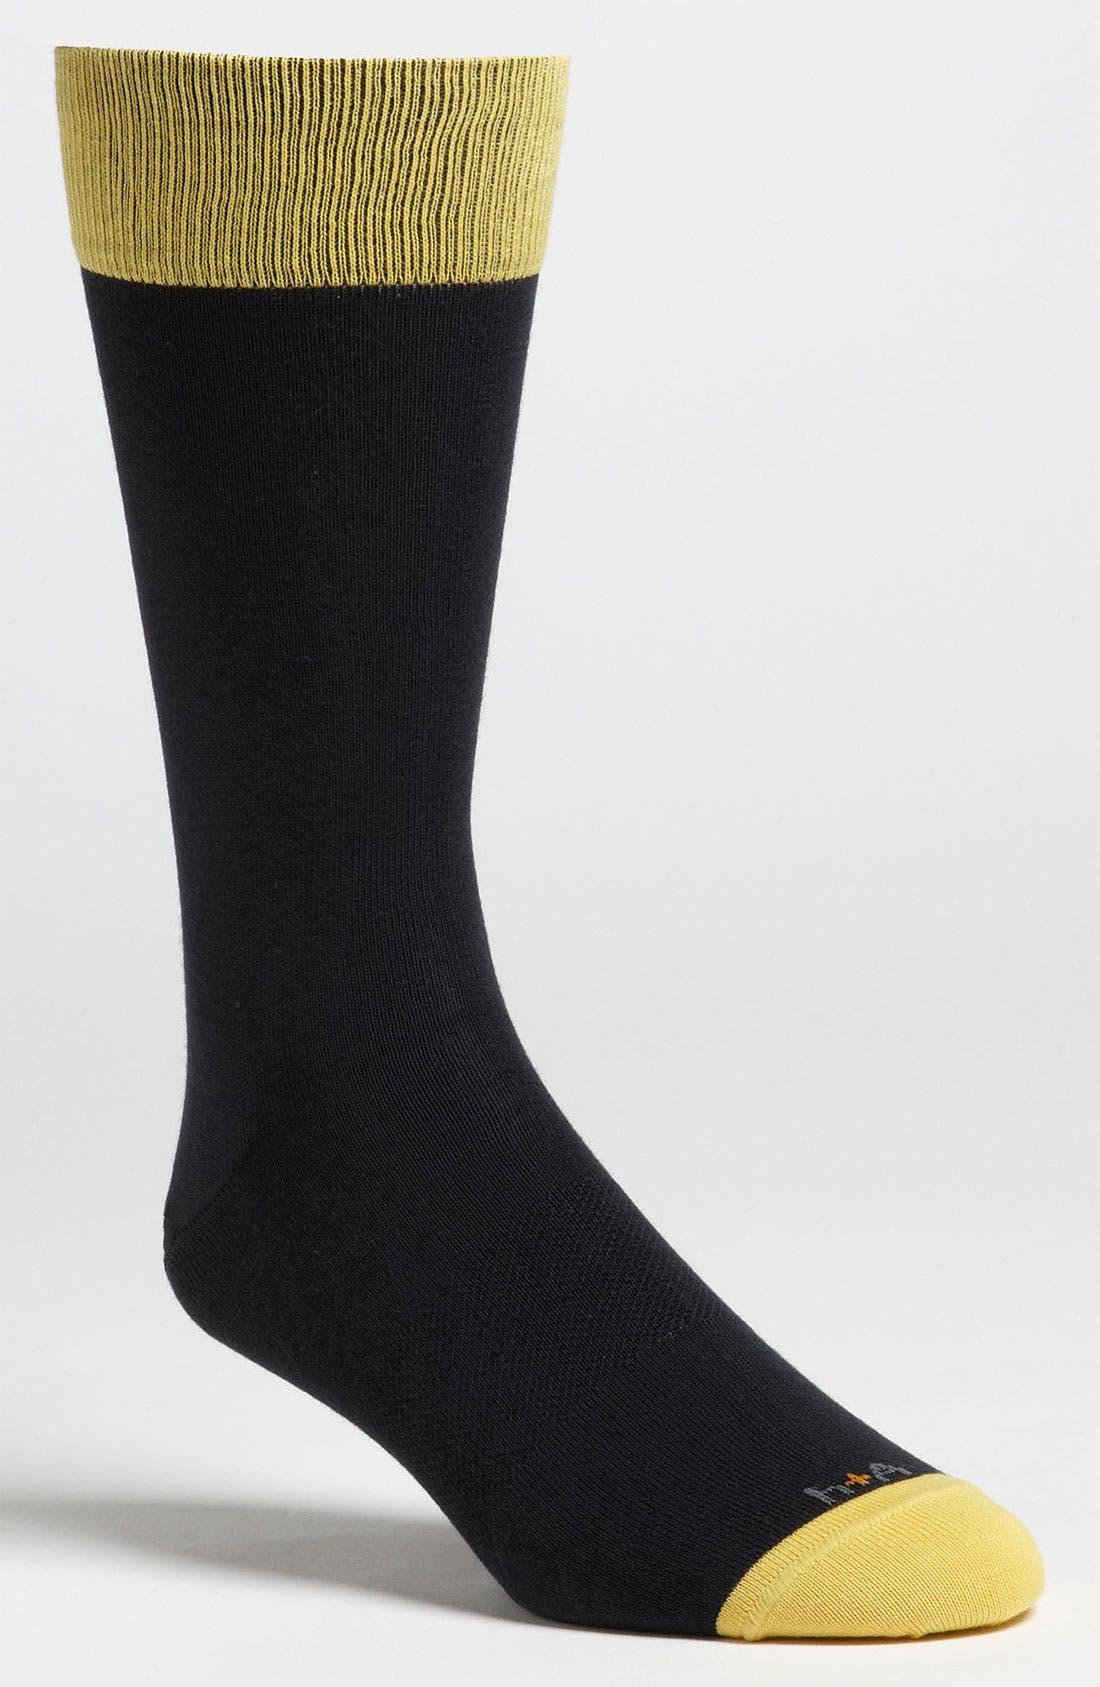 Alternate Image 1 Selected - hook + ALBERT Pima Cotton Color Block Socks